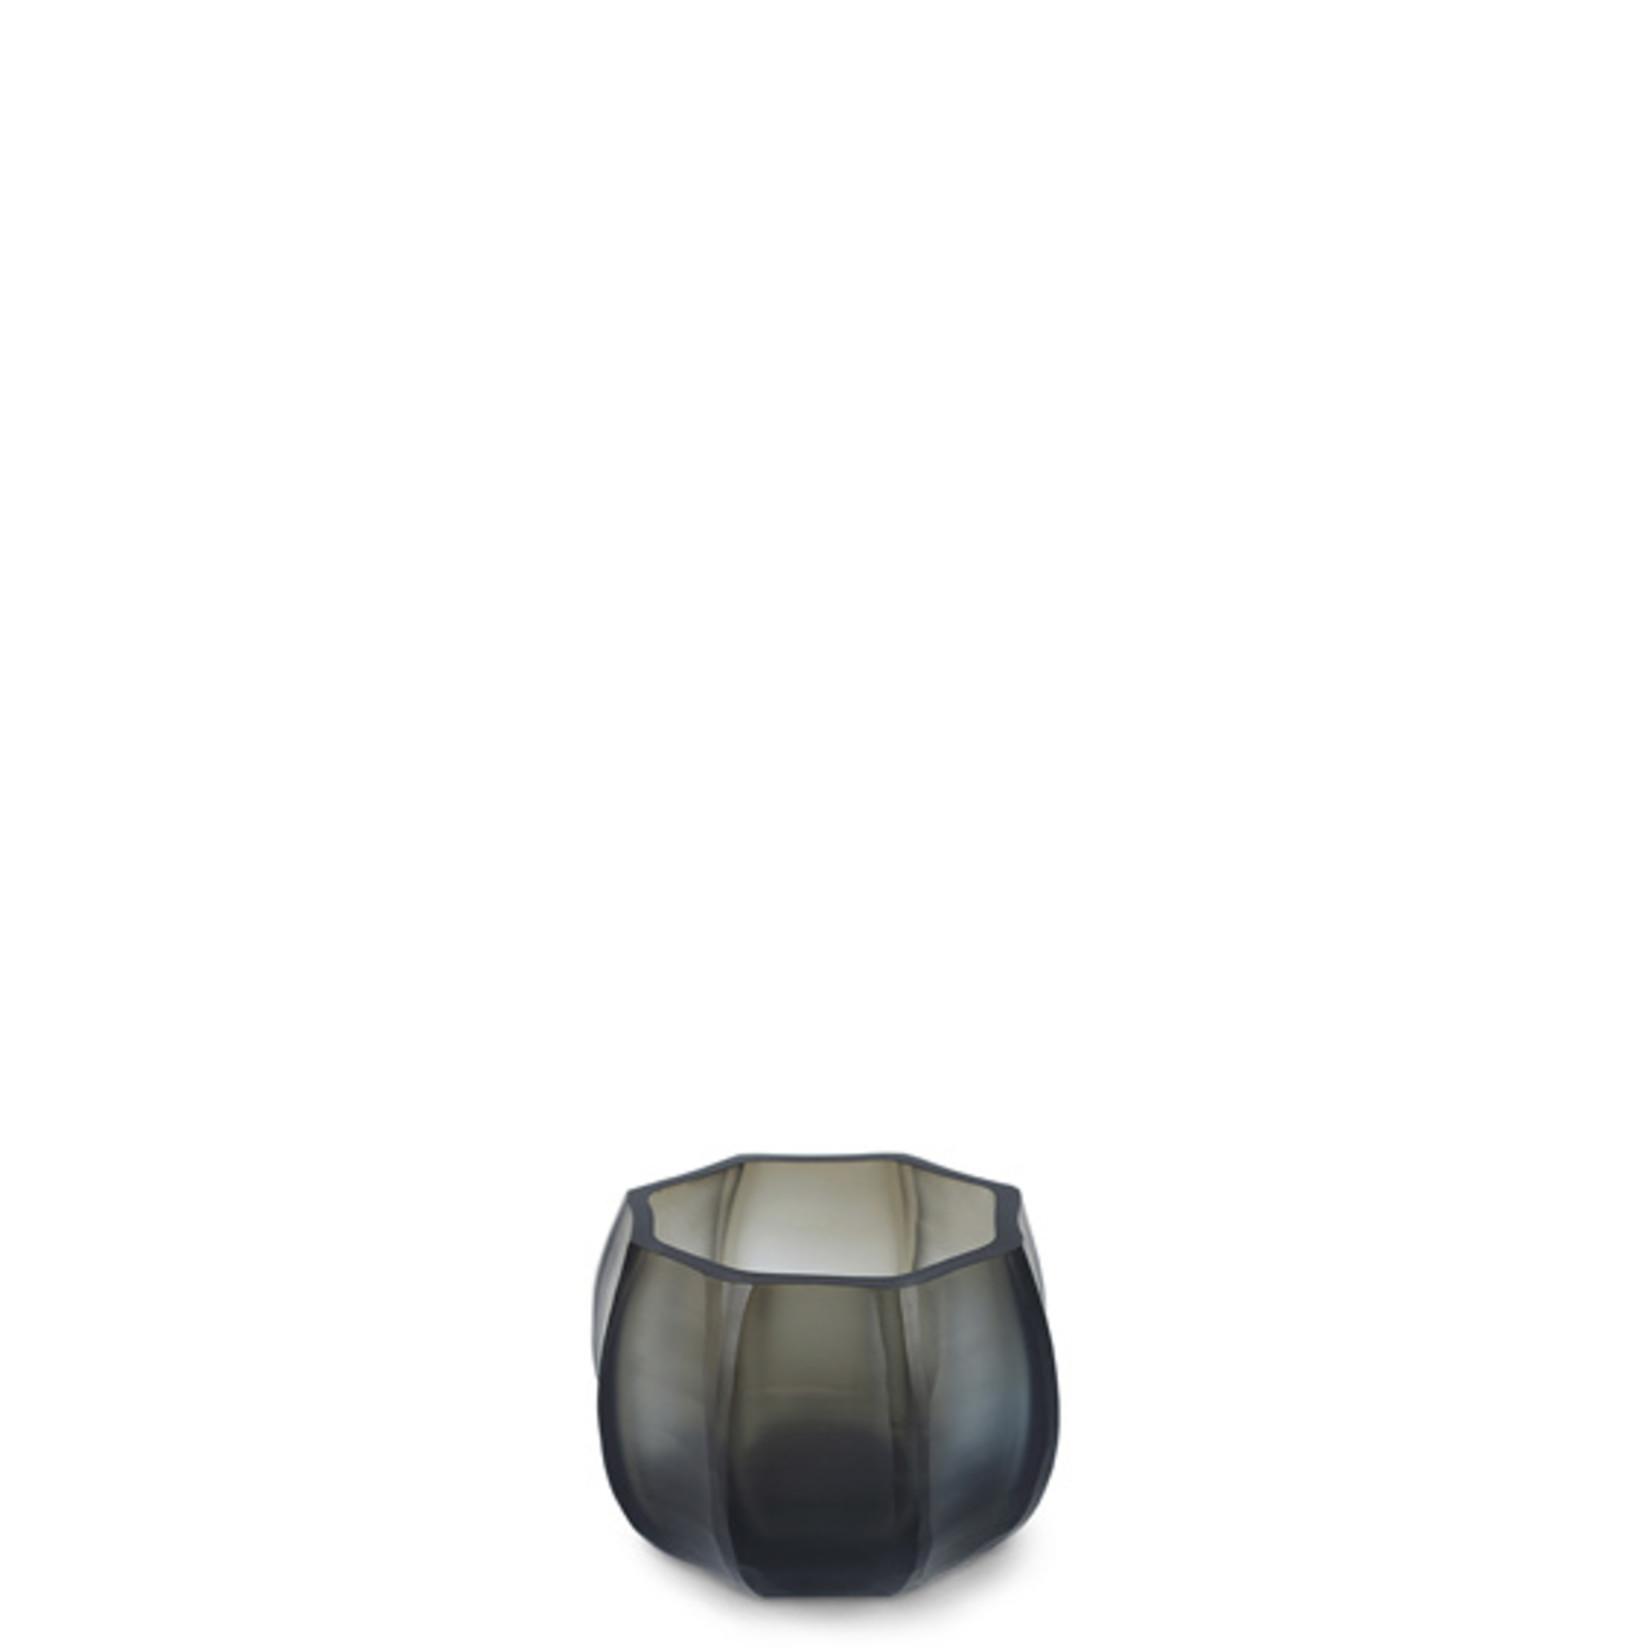 Guaxs Tea light holder Koonam   Indigo / Smoke Gray